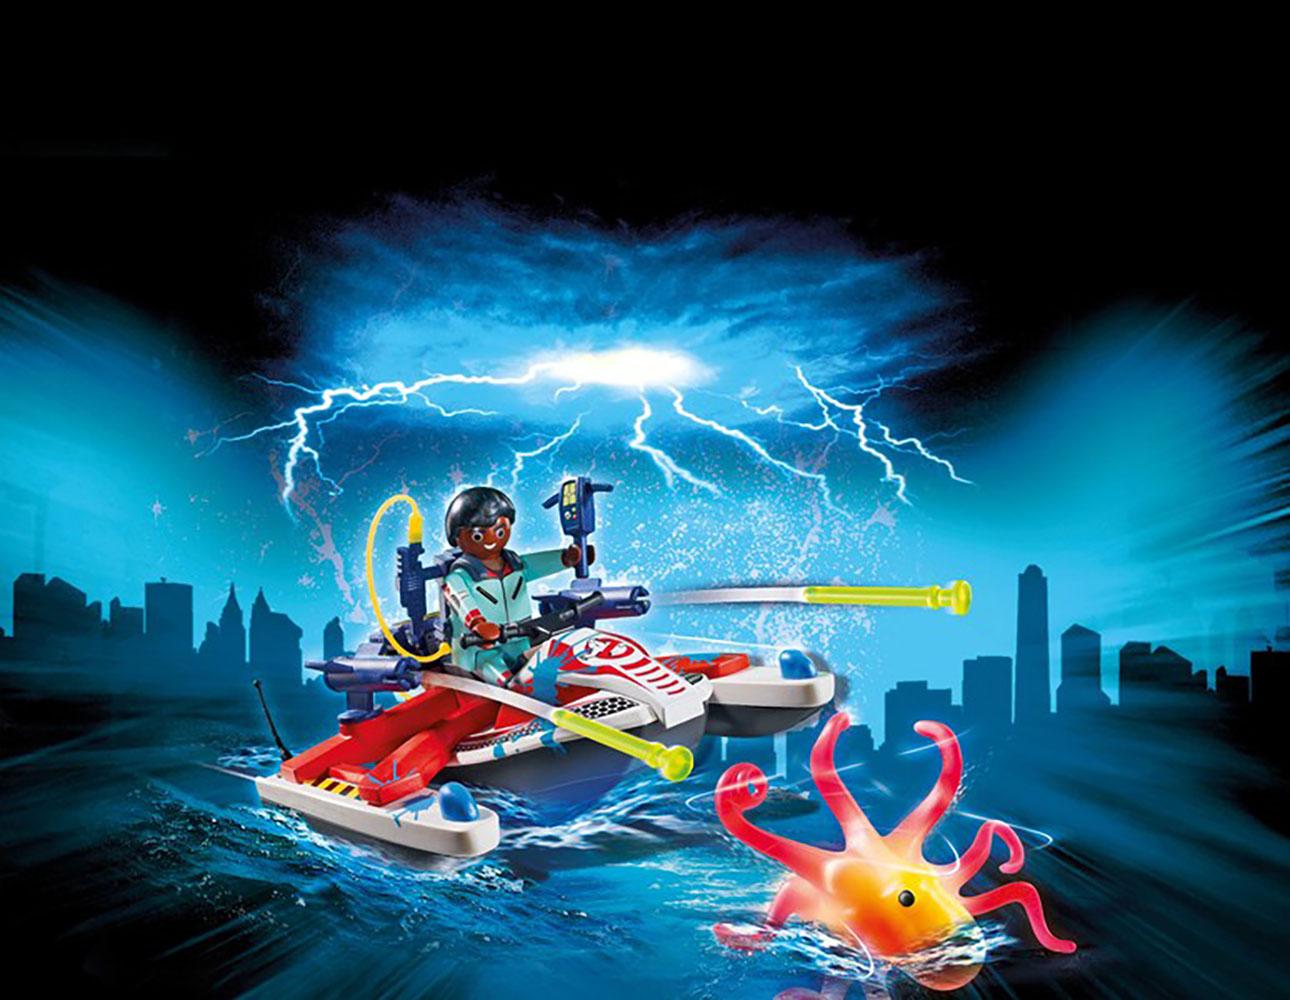 Ghostbusters - Zeddemore avec scooter des mers